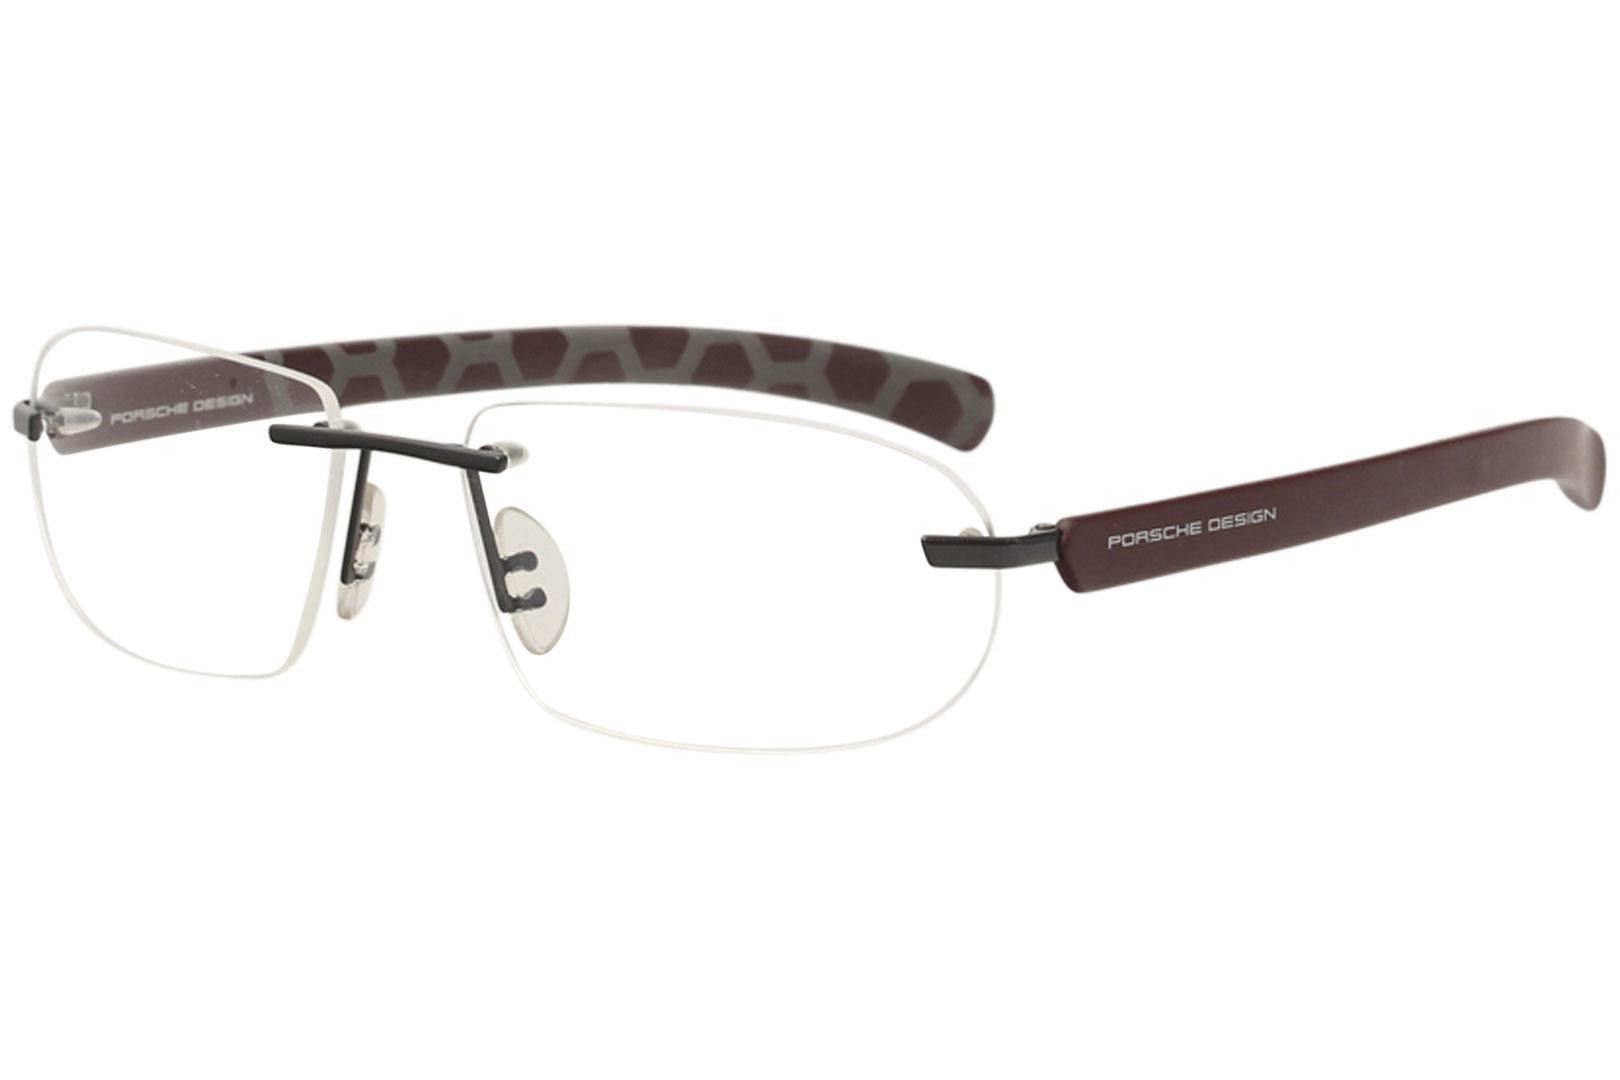 6dcec120294 Porsche Design Men s Eyeglasses P8202 P 8202 Rimless Titanium Optical Frame